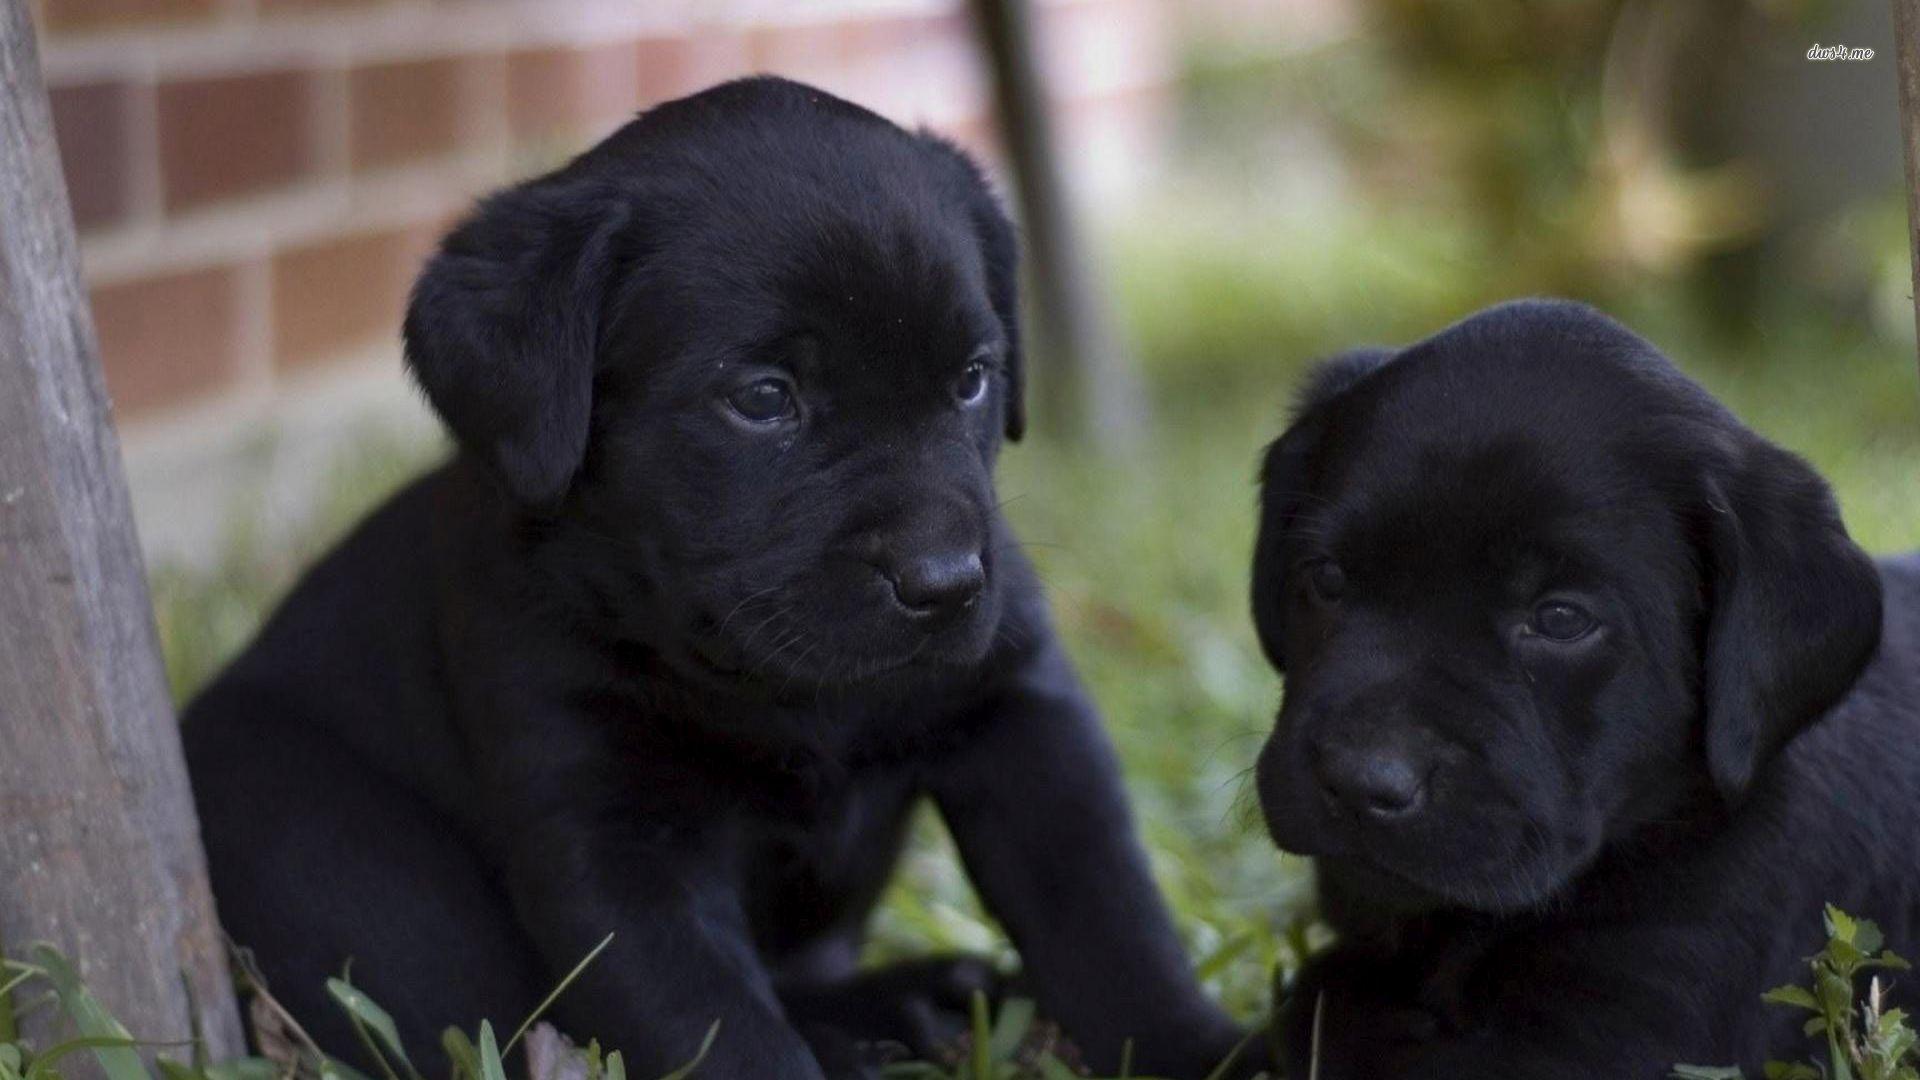 Black Labrador Puppies wallpaper   Animal wallpapers   27901 1920x1080